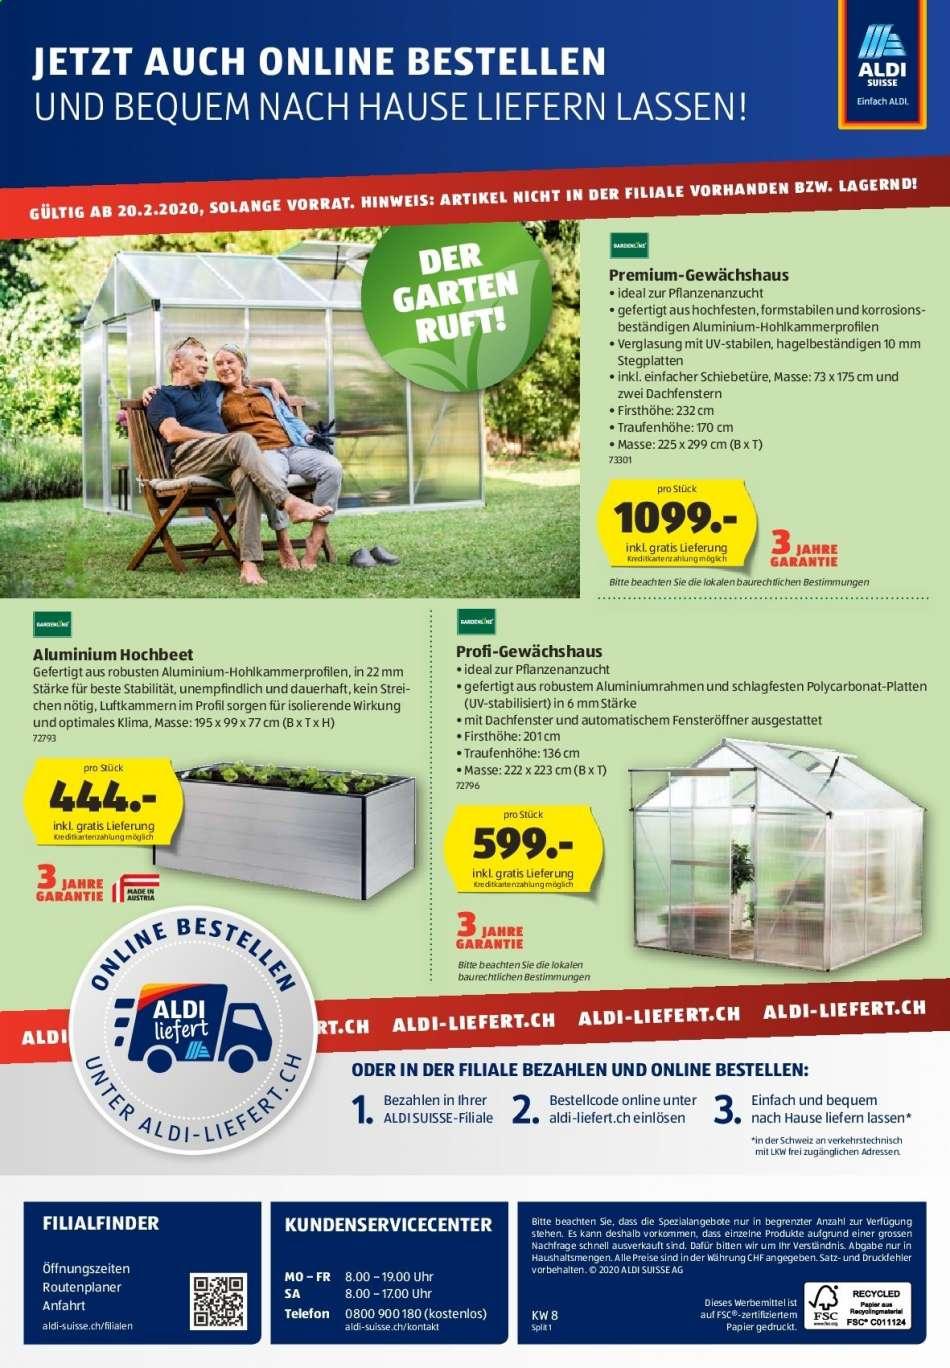 Full Size of Aldi Prospekt 2022020 2622020 Rabatt Kompass Garten Hochbeet Relaxsessel Wohnzimmer Hochbeet Aldi